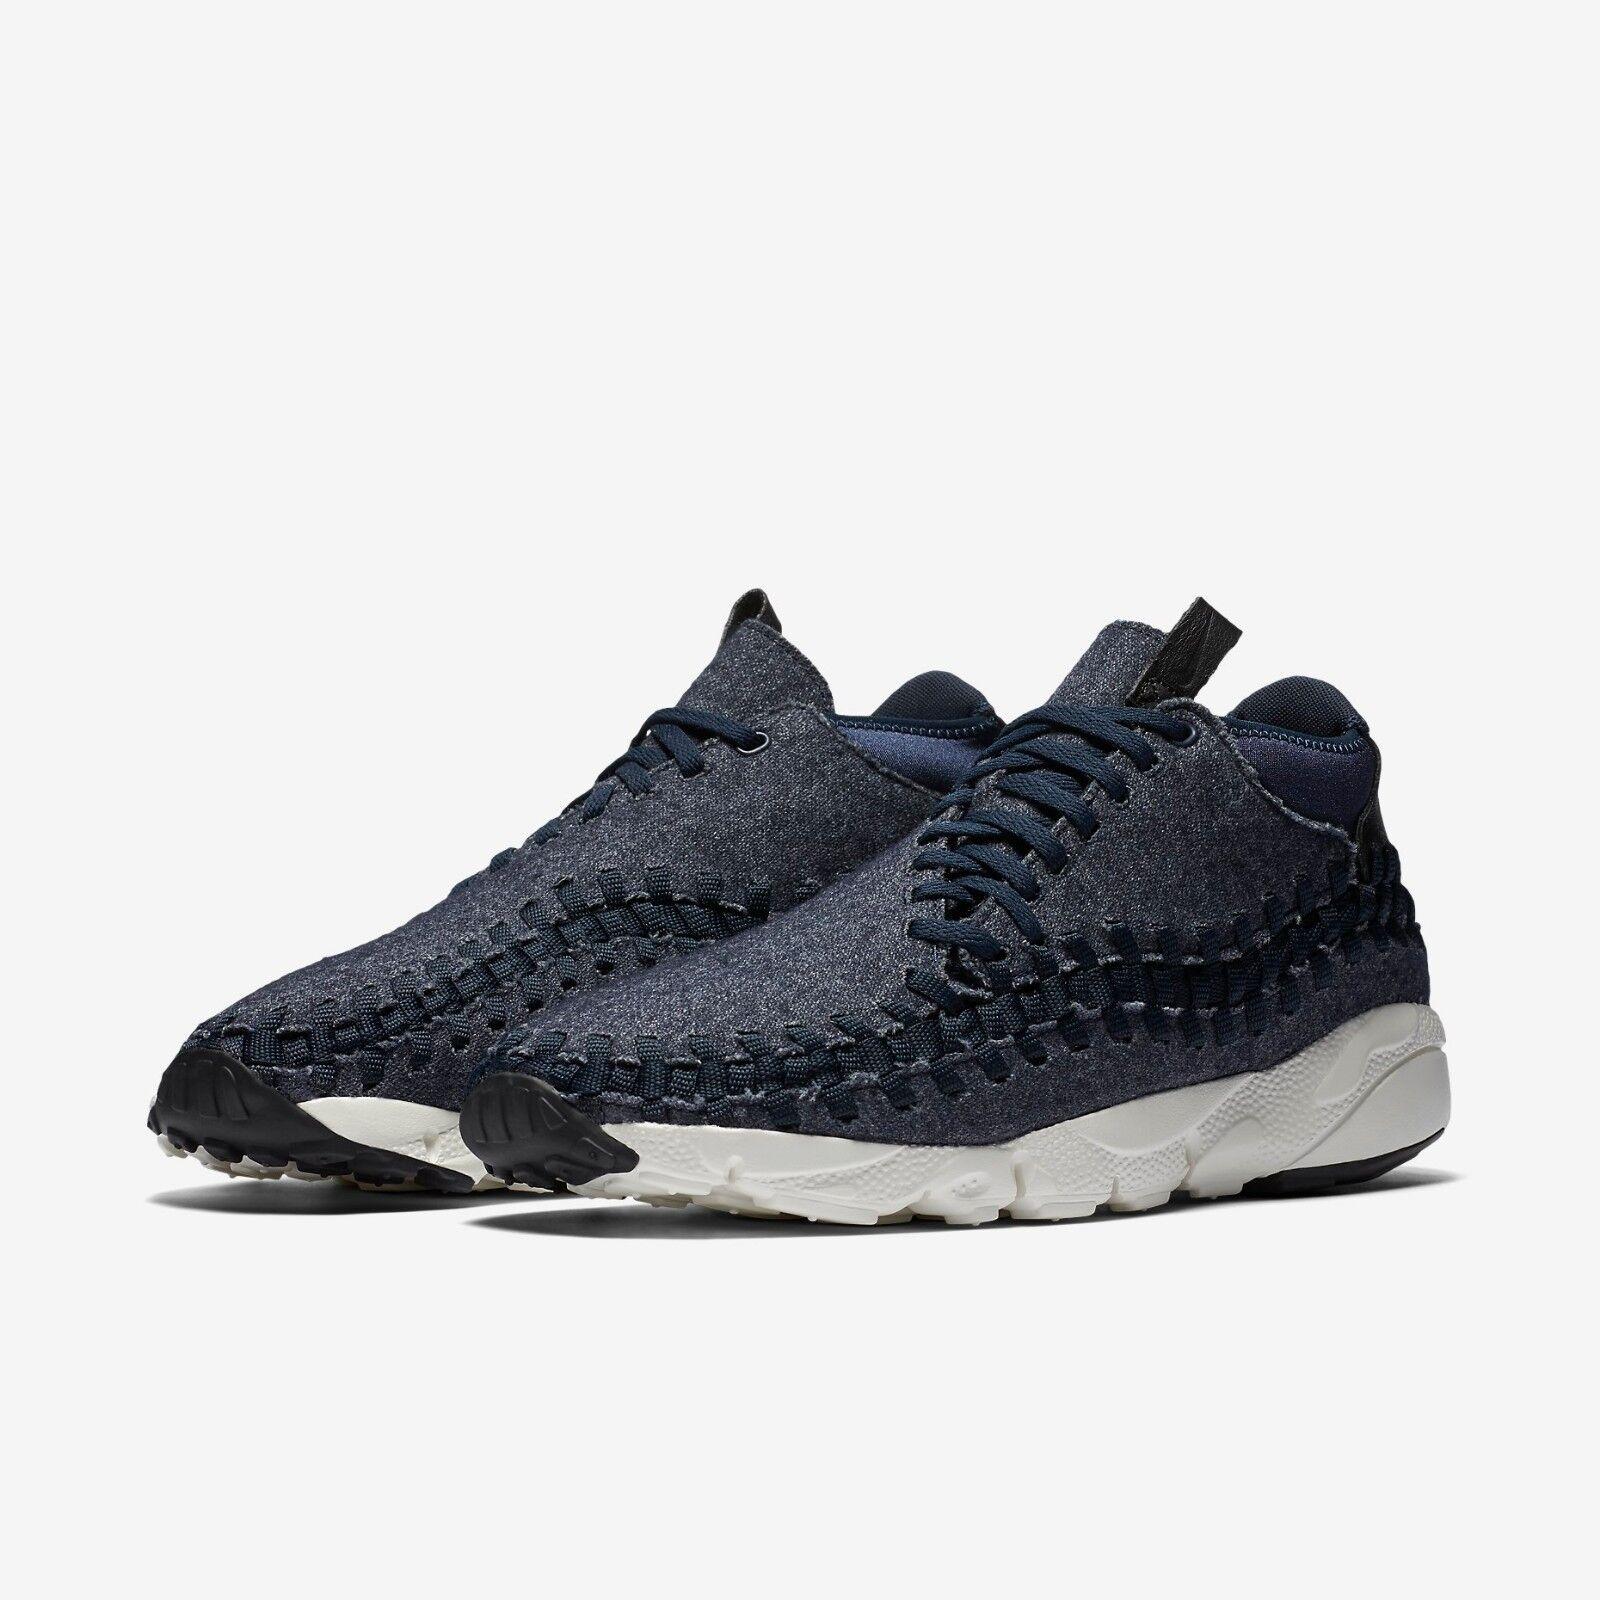 Nike Air Footscape Woven Chukka SE shoes Mens 11 Obsidian Black Sail 857874 400